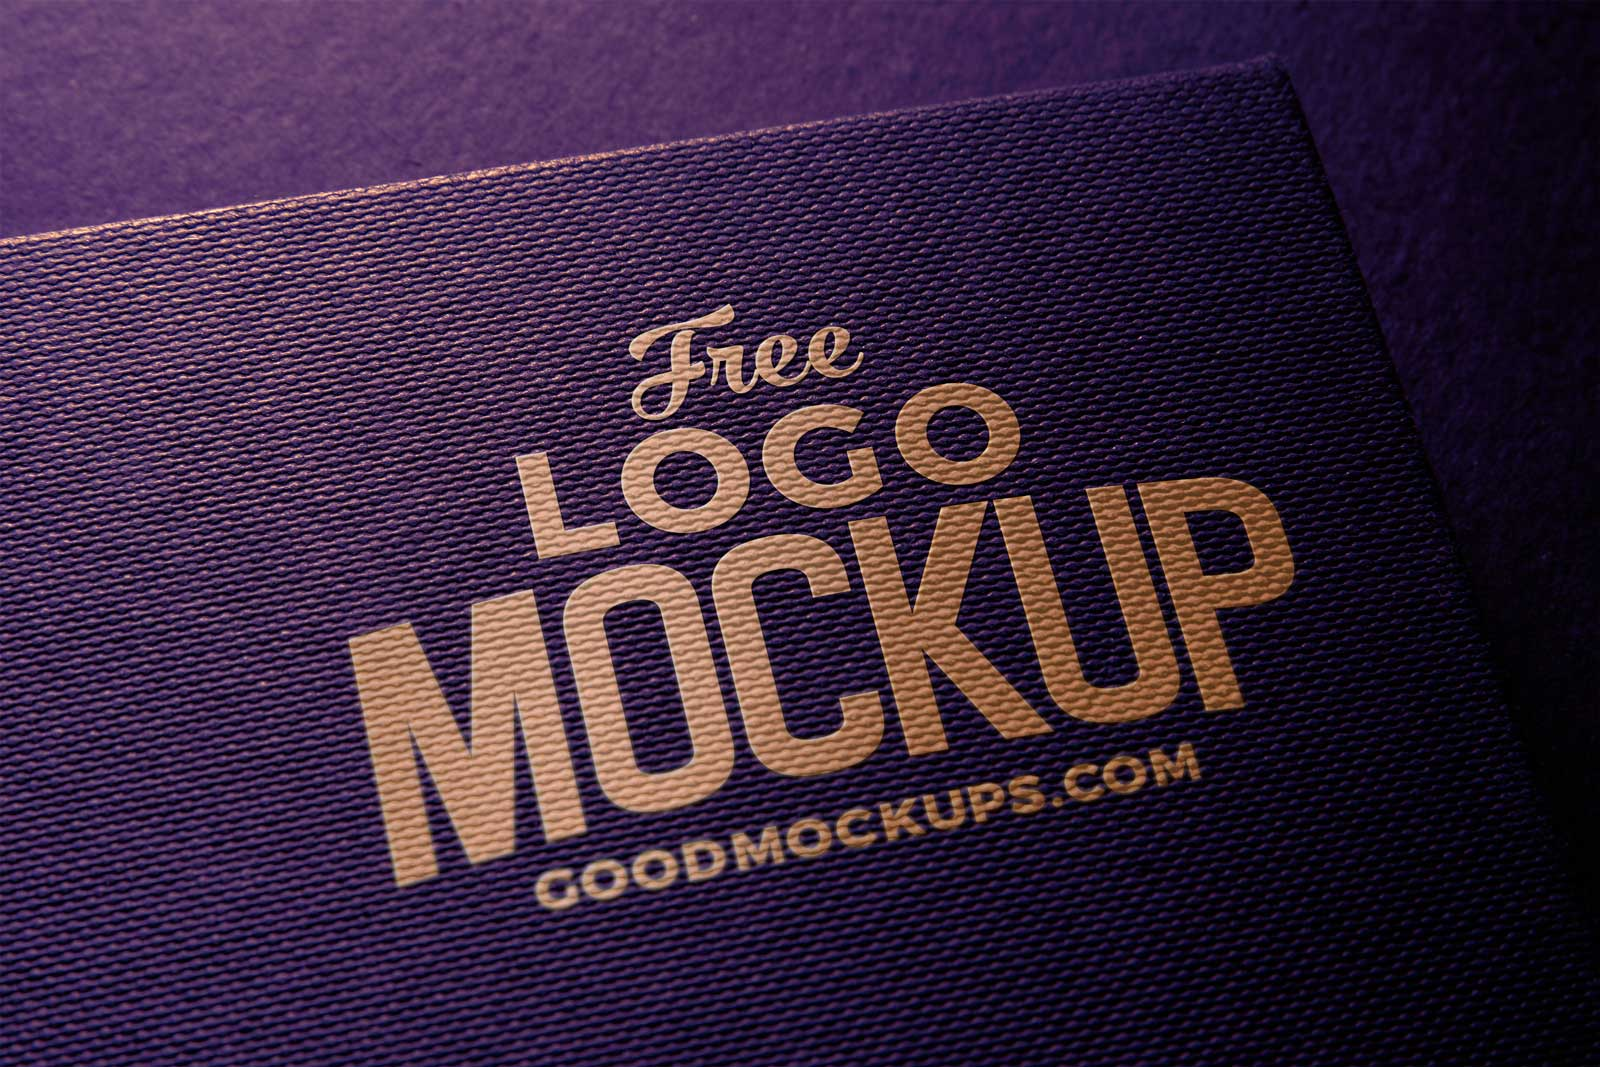 Free-Photorealistic-Logo-Mockup-PSD-file